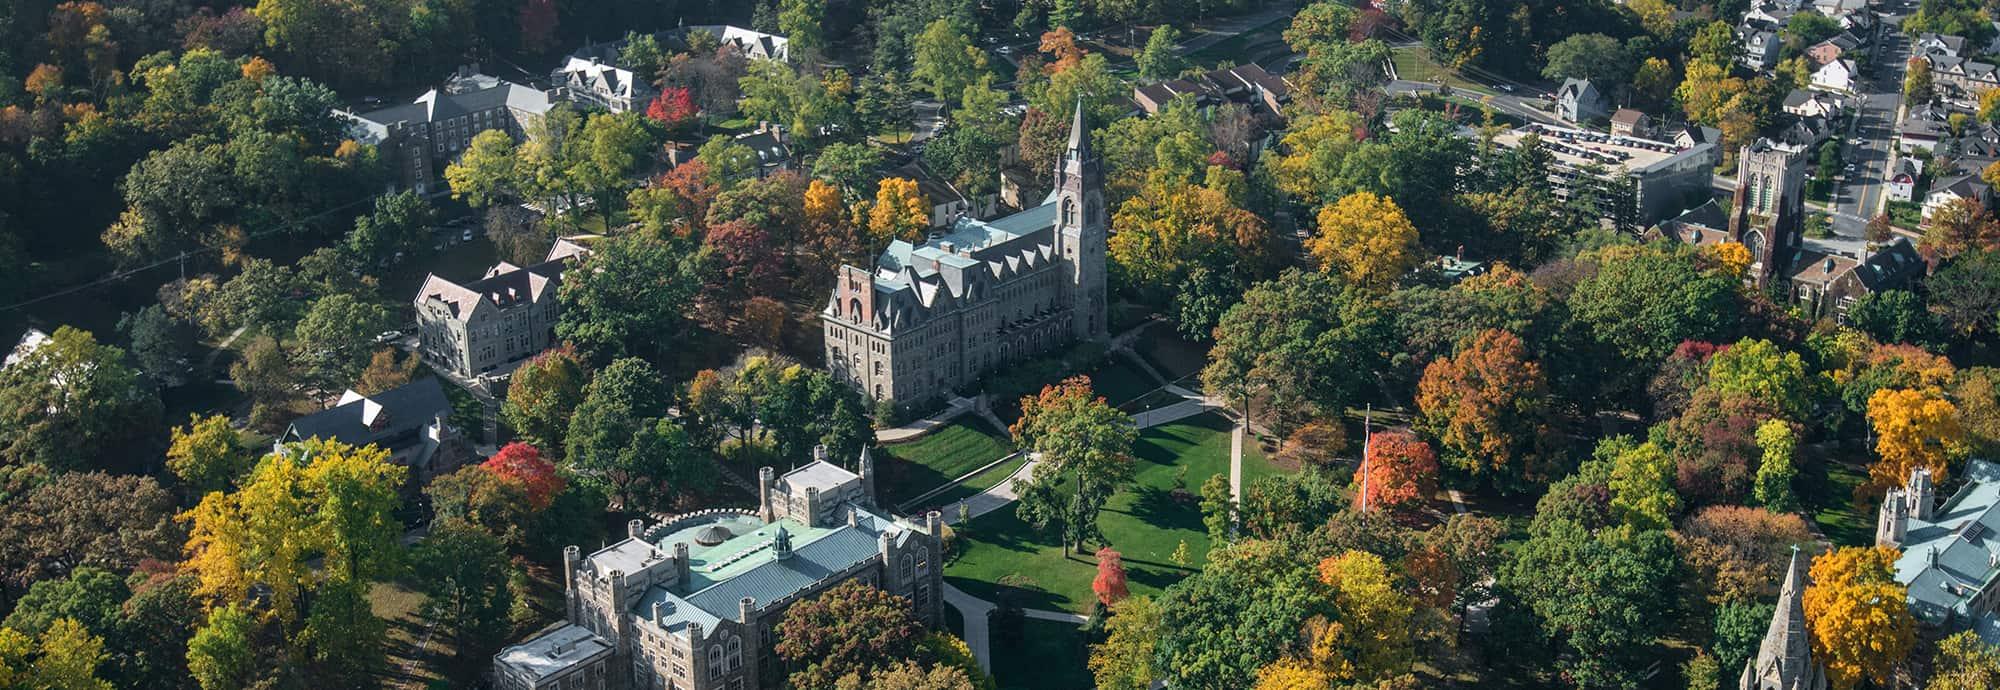 Aerial view of Lehigh University Asa Packer Campus